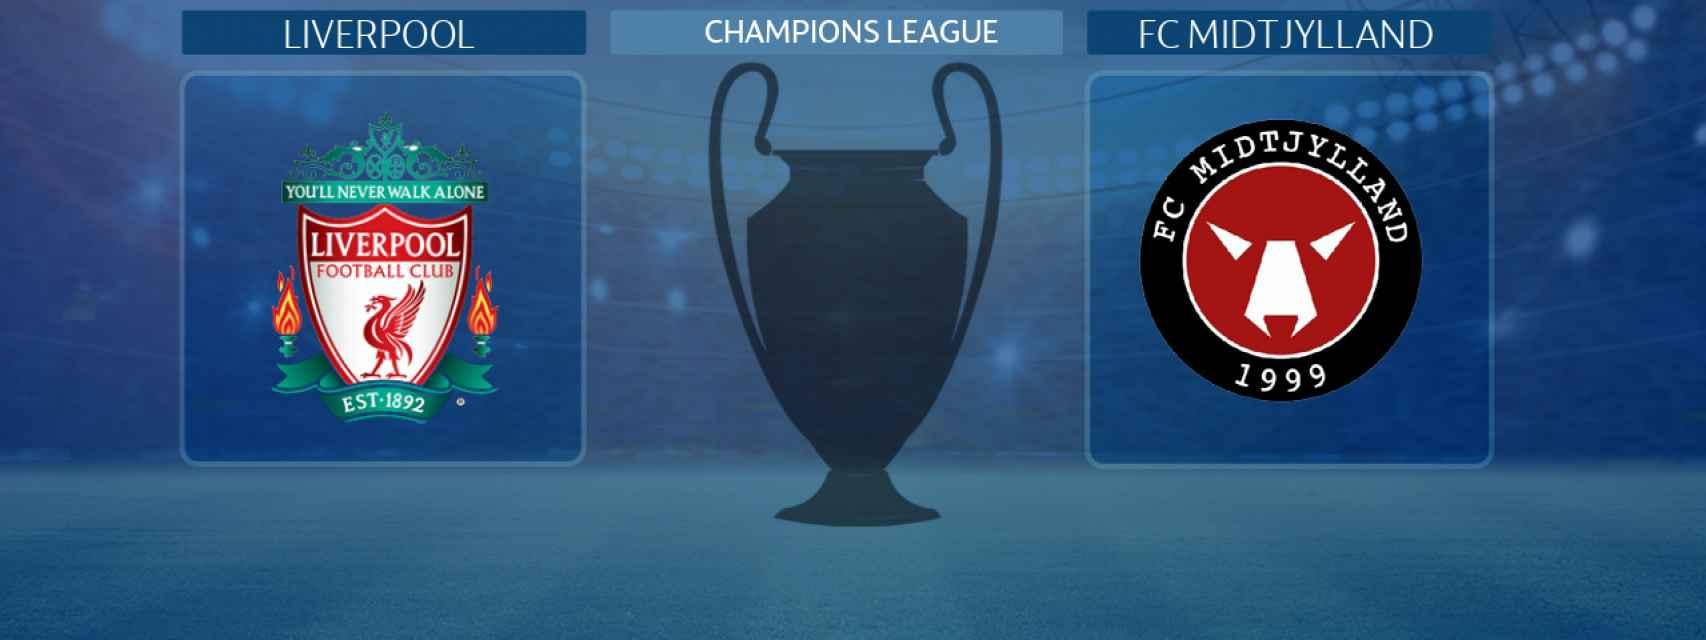 Liverpool - FC Midtjylland, partido de la Champions League